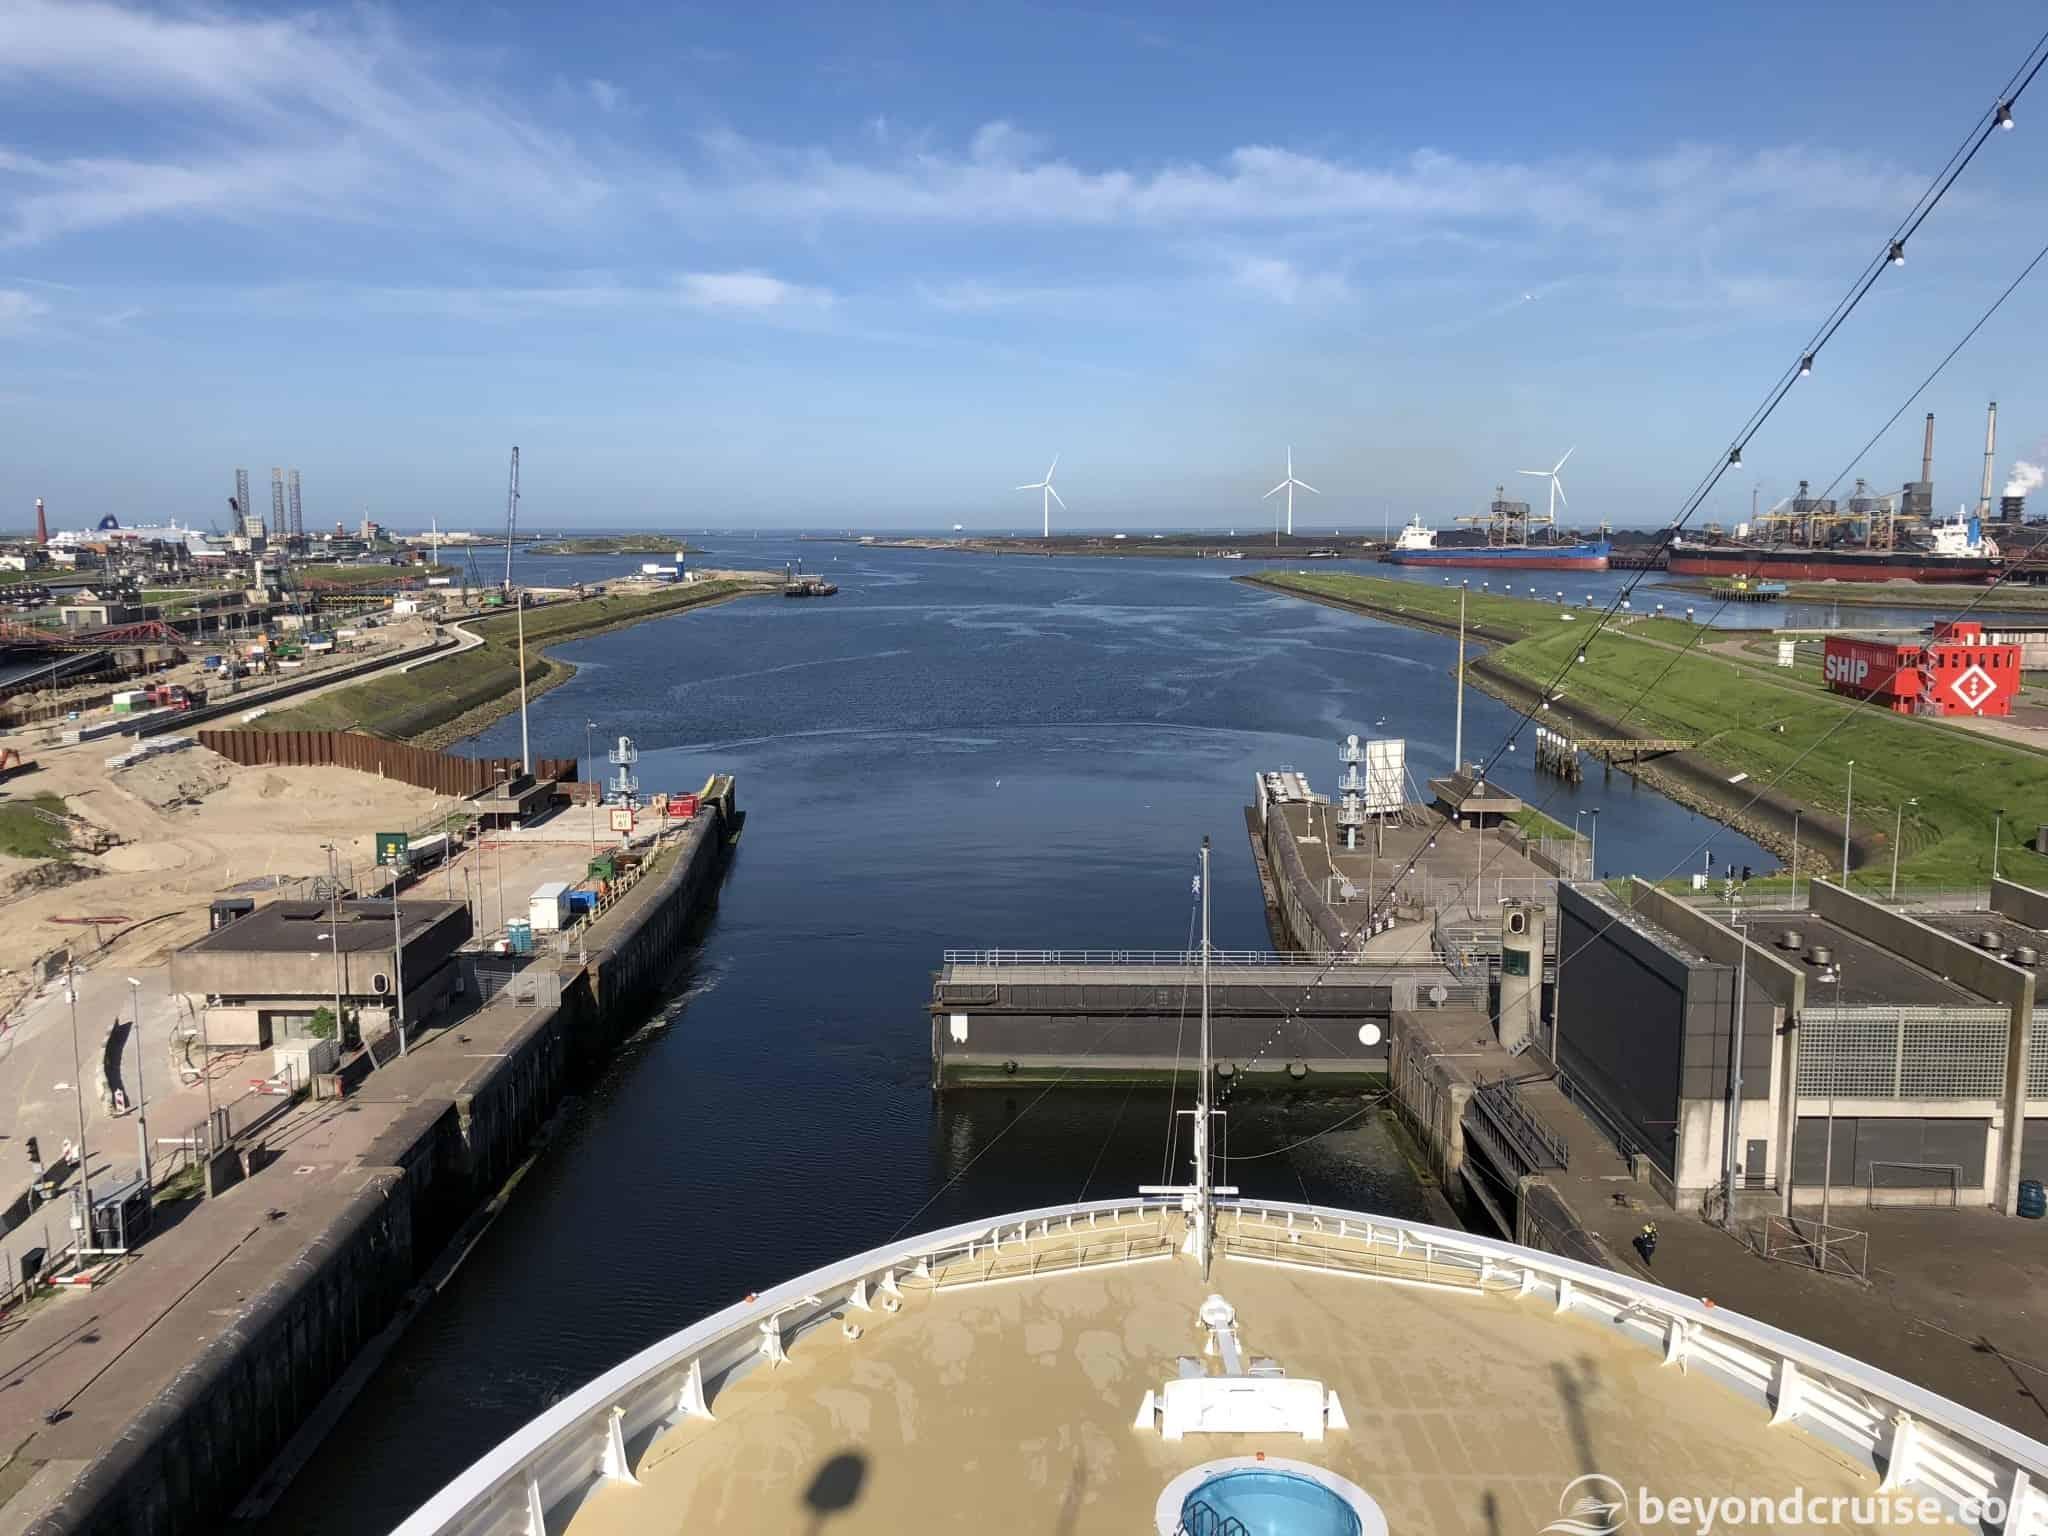 MSC Magnifica leaving IJmuiden locks